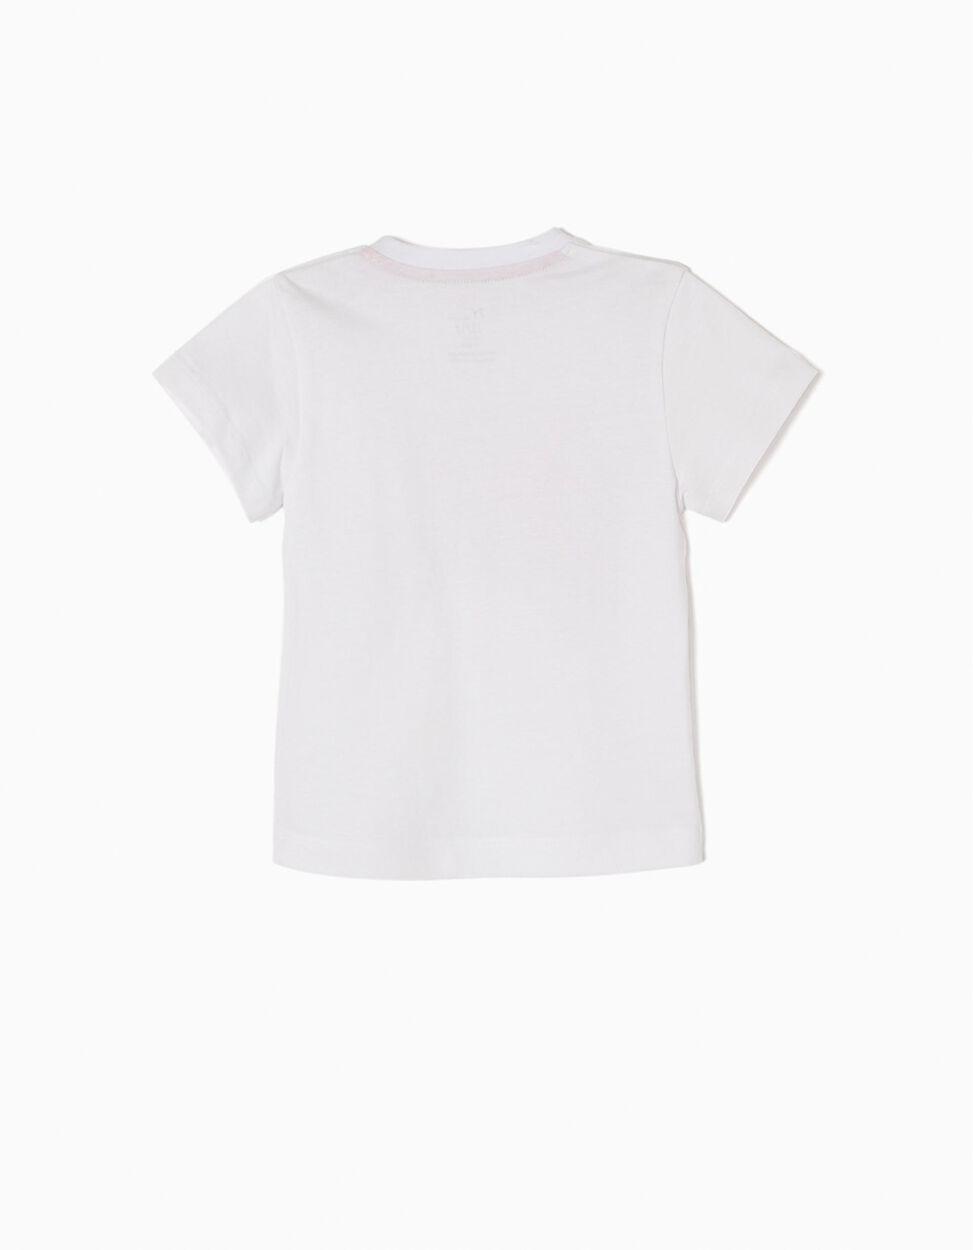 T-shirt Basebol Cinzenta